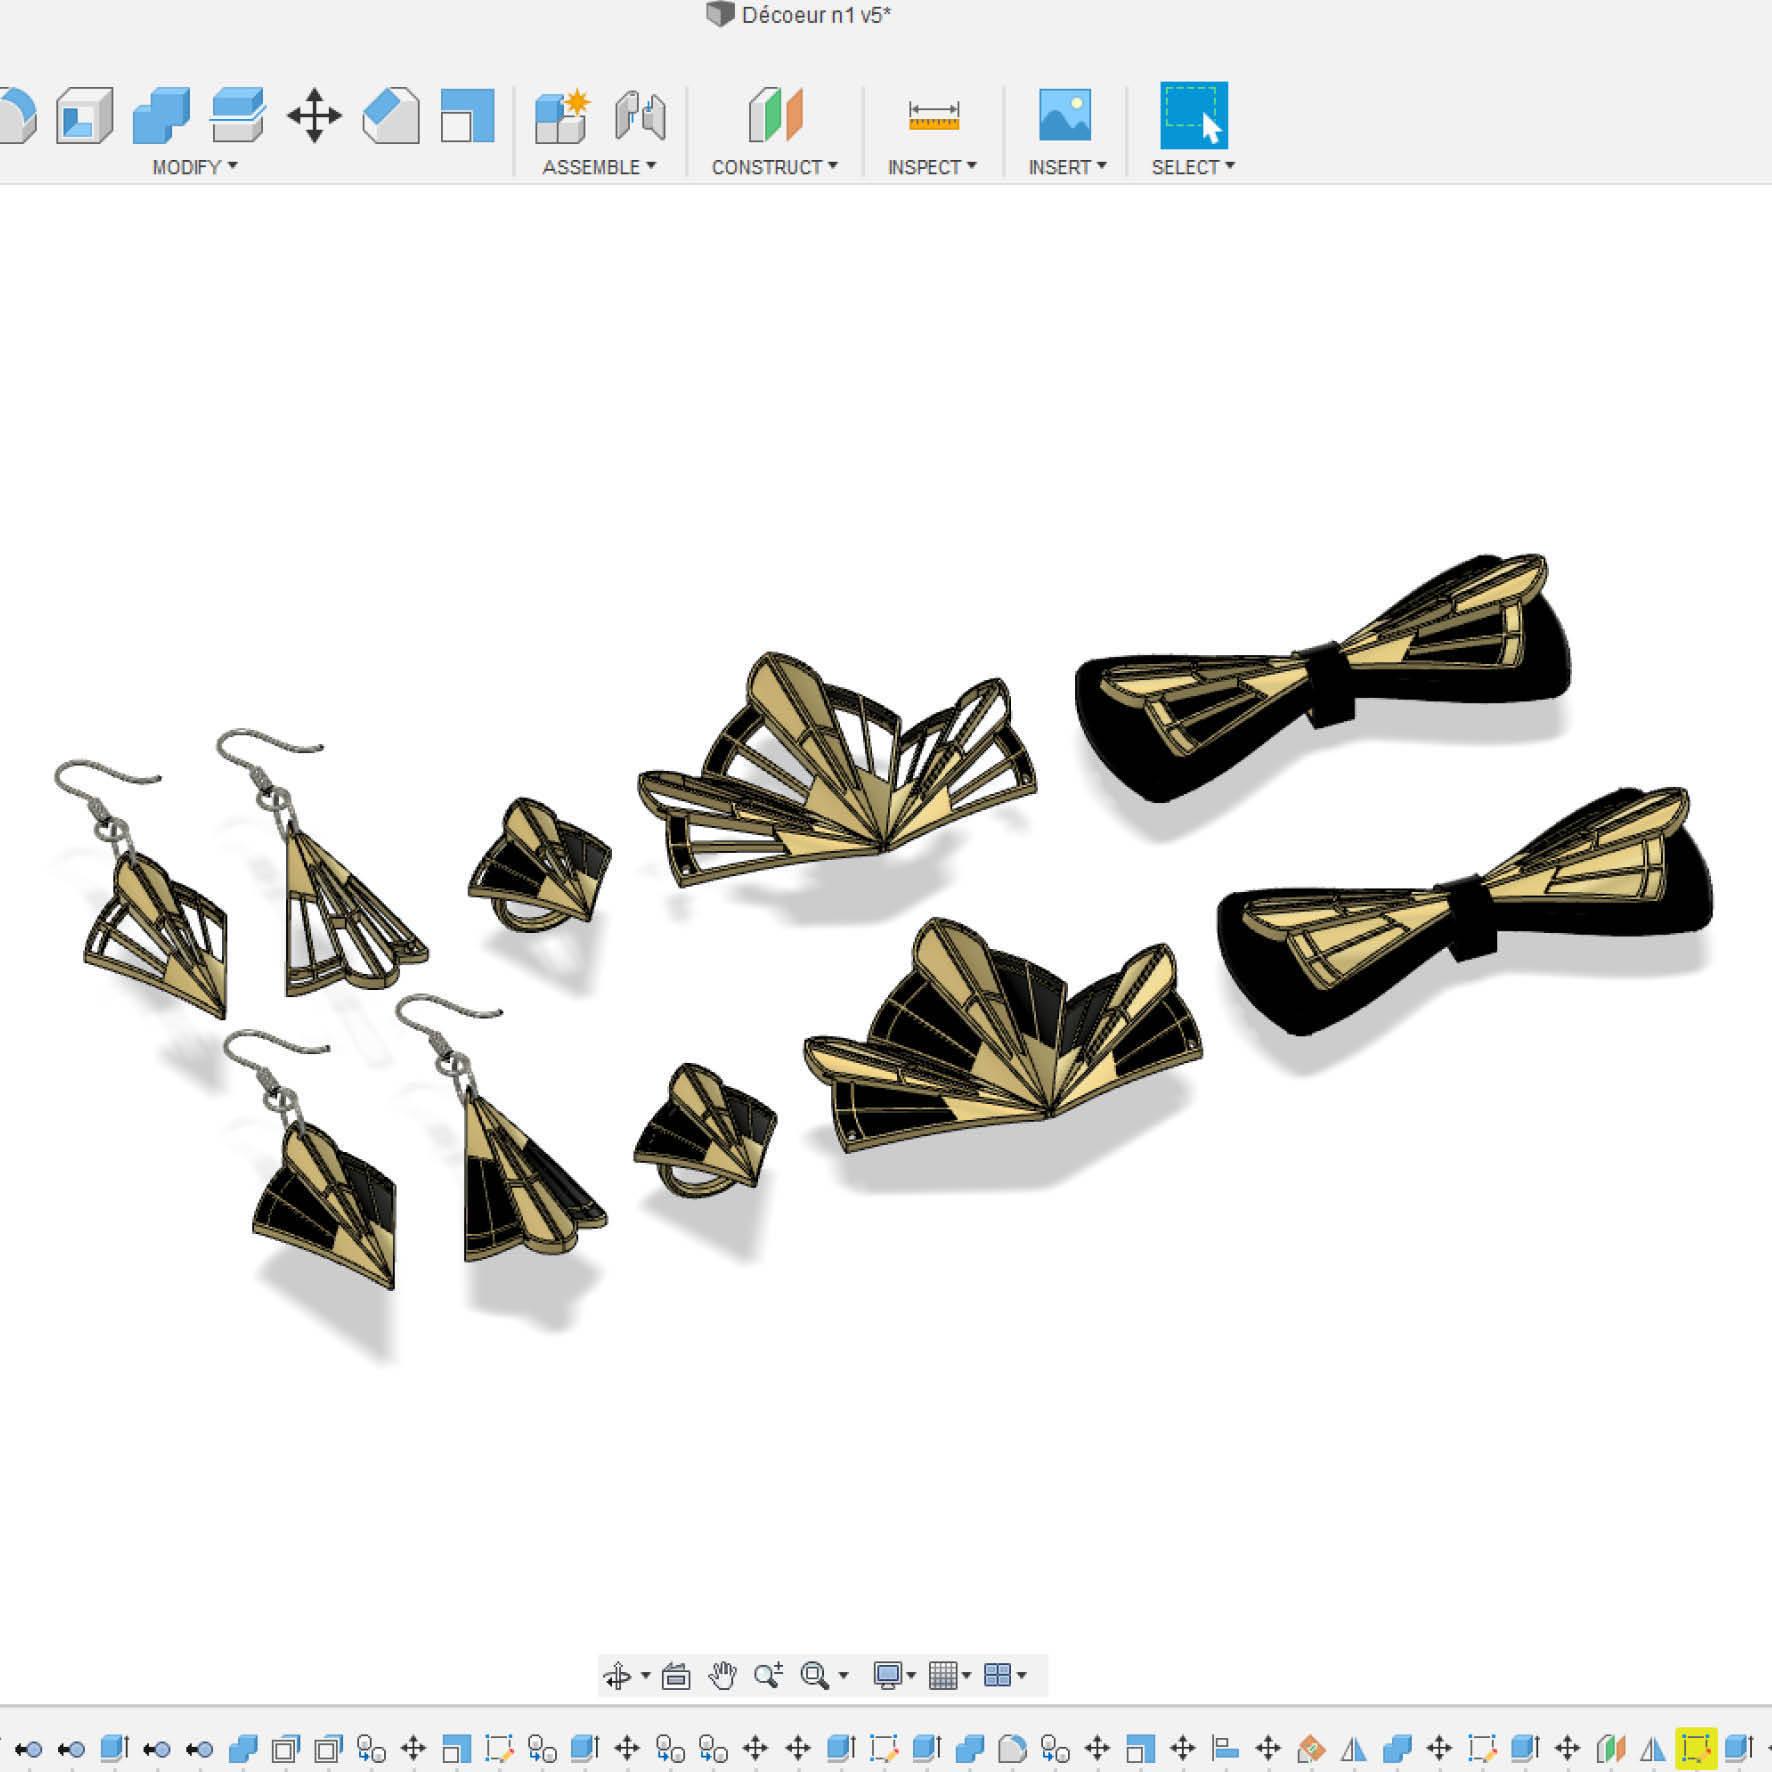 Sin título-12.jpg Download free STL file bijoux decoeur nº1 • 3D printable model, ArtViche